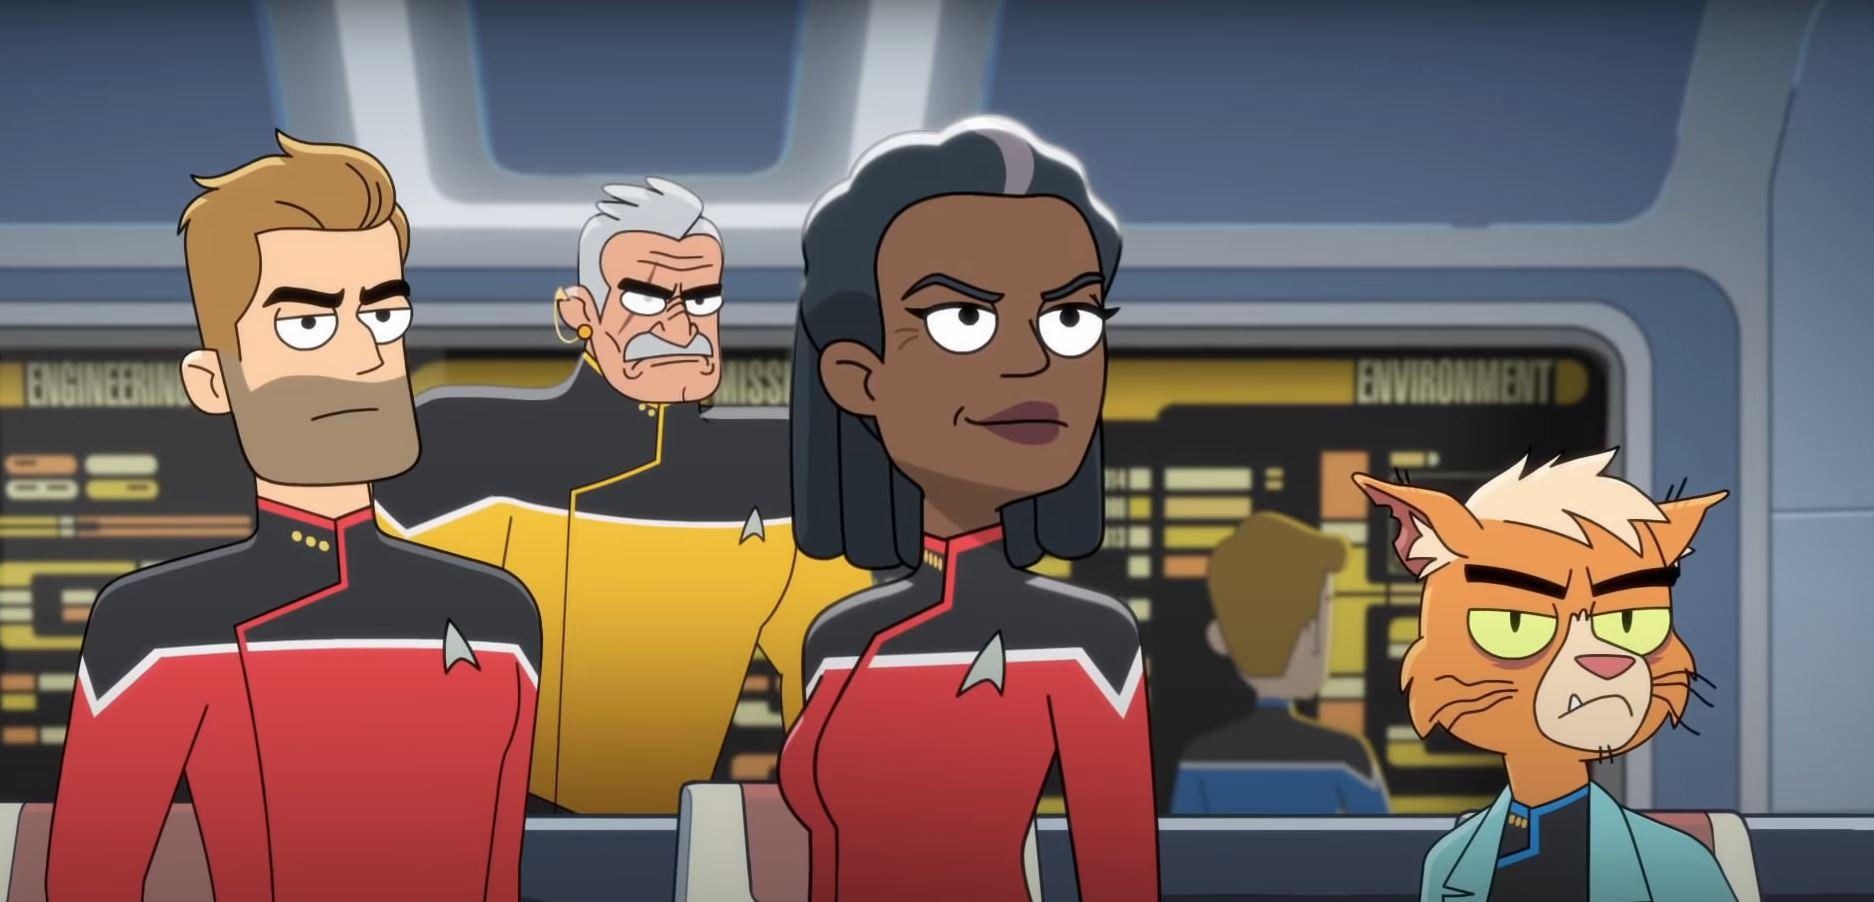 Трейлер комедийного мультсериала Star Trek: Lower Decks